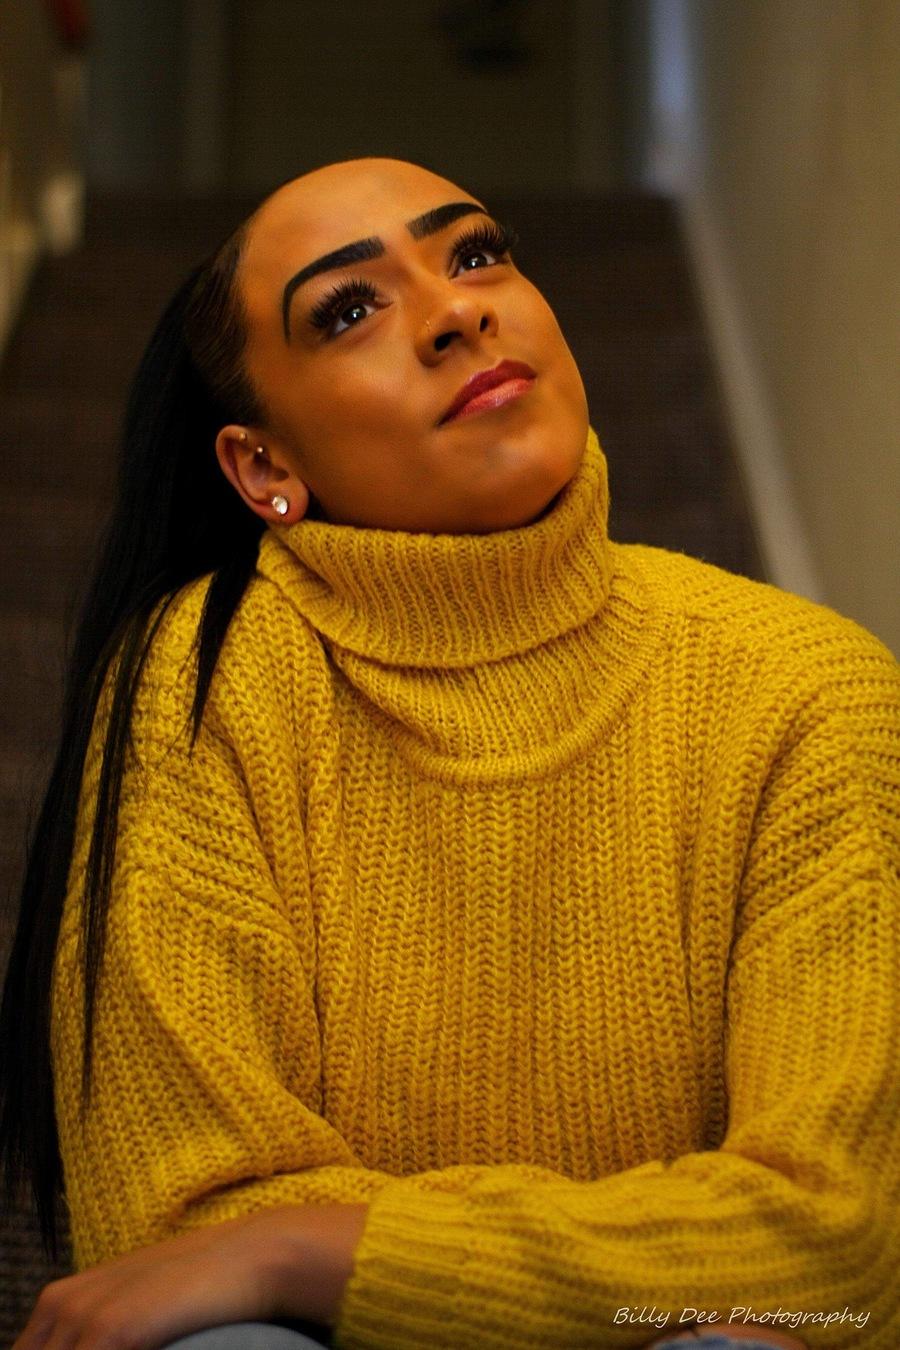 Photography by Billy Dee Photography, Model Carlene Parkins, Makeup by Carlene Parkins, Stylist Carlene Parkins, Hair styling by Carlene Parkins / Uploaded 4th April 2019 @ 10:41 PM